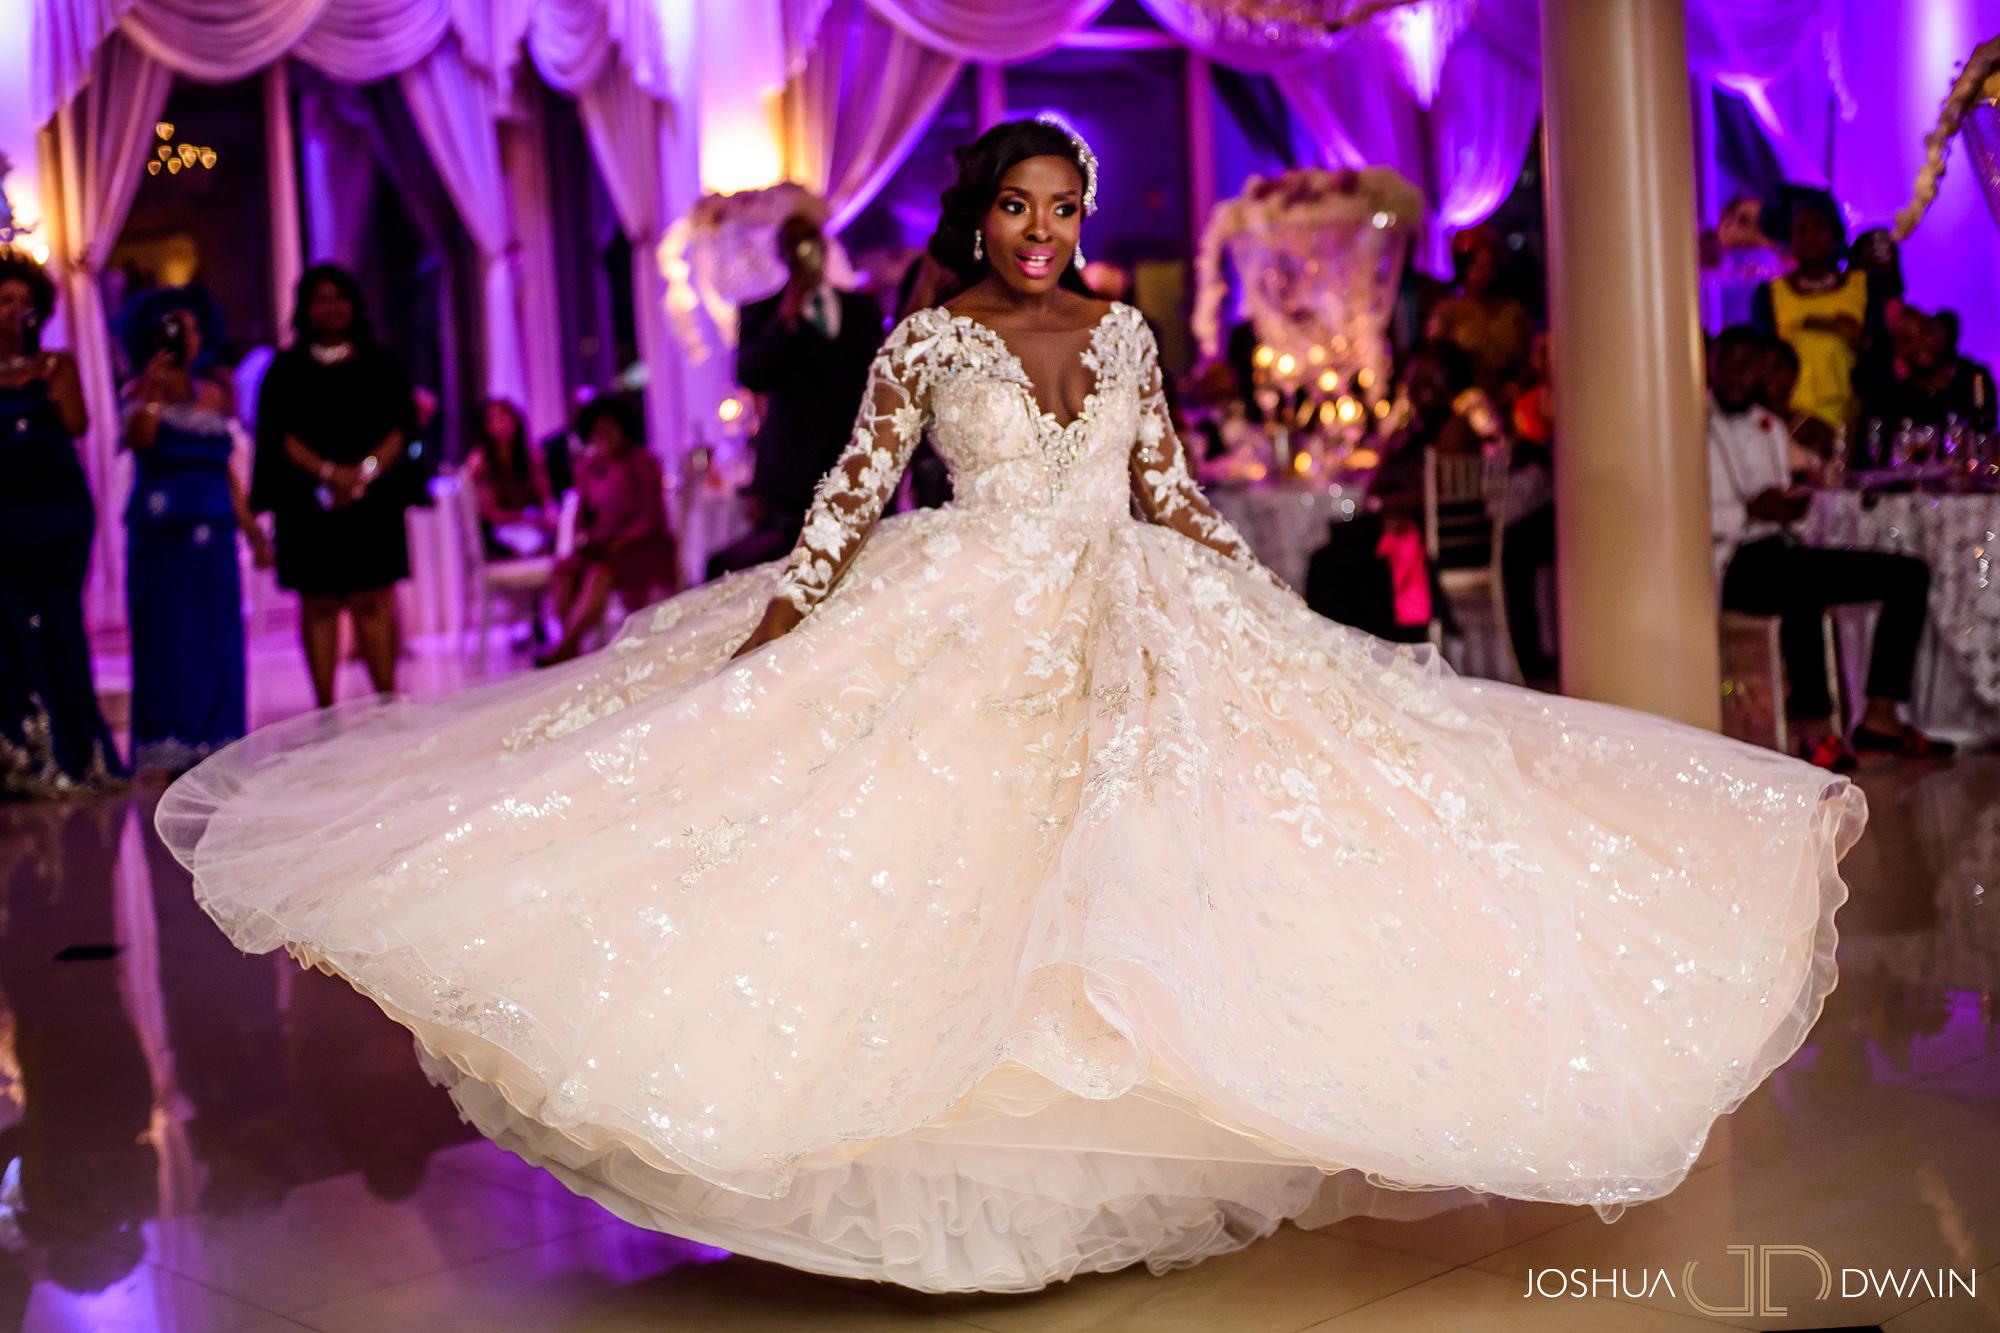 joshua-dwain-weddings-gallery-best-wedding-photographers-us-012